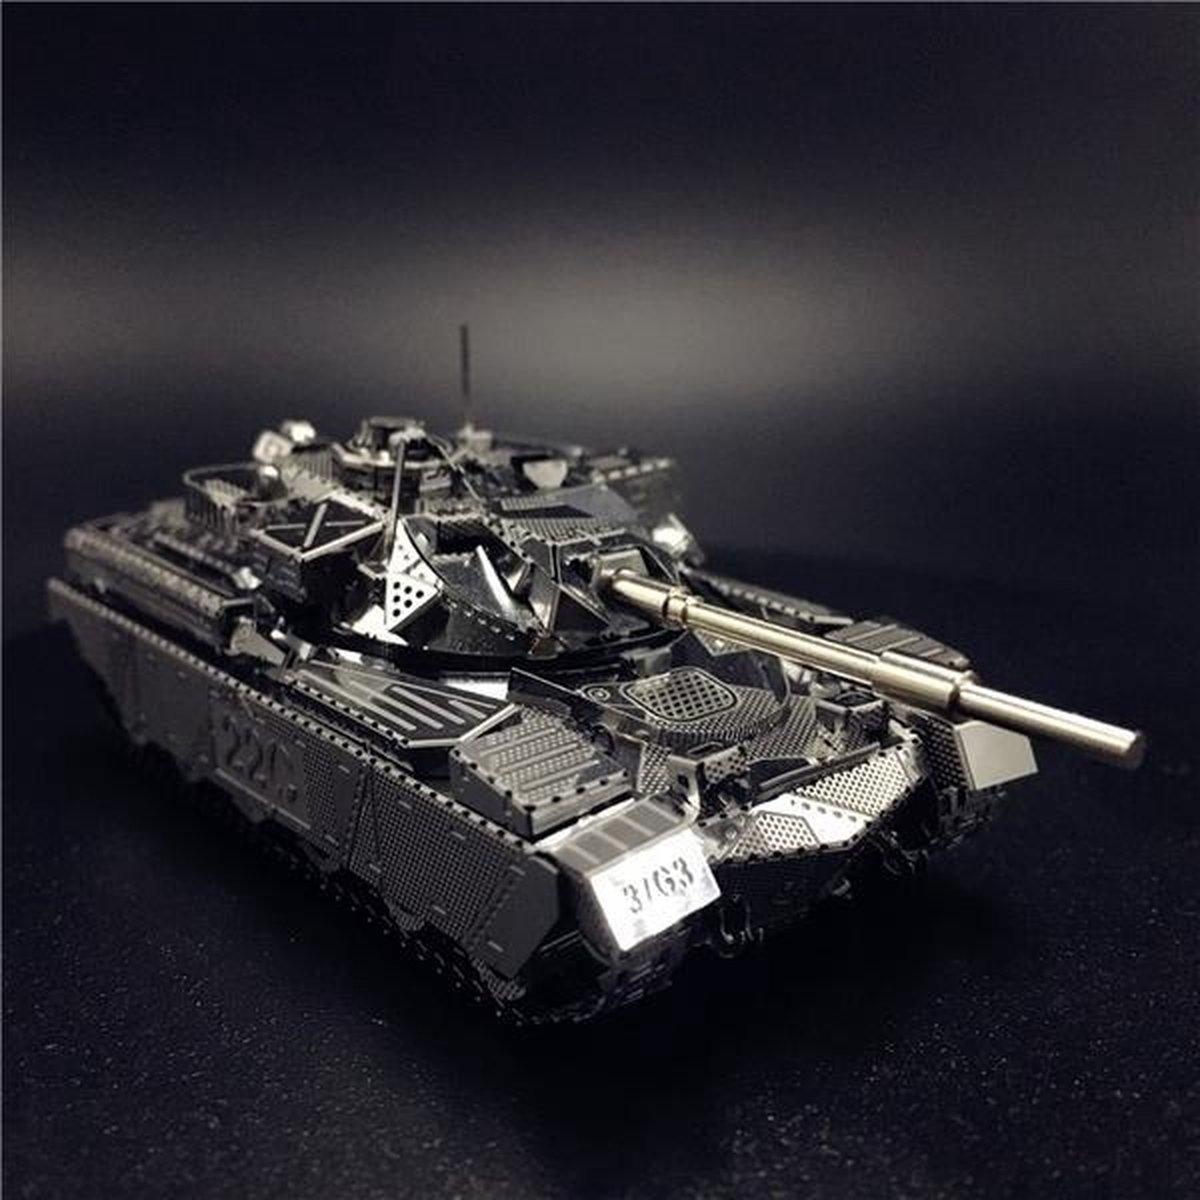 3d puzzel metaal tank Chieftain MK50, 3d puzzel Chiefain MK50, 3d puzzel MK50